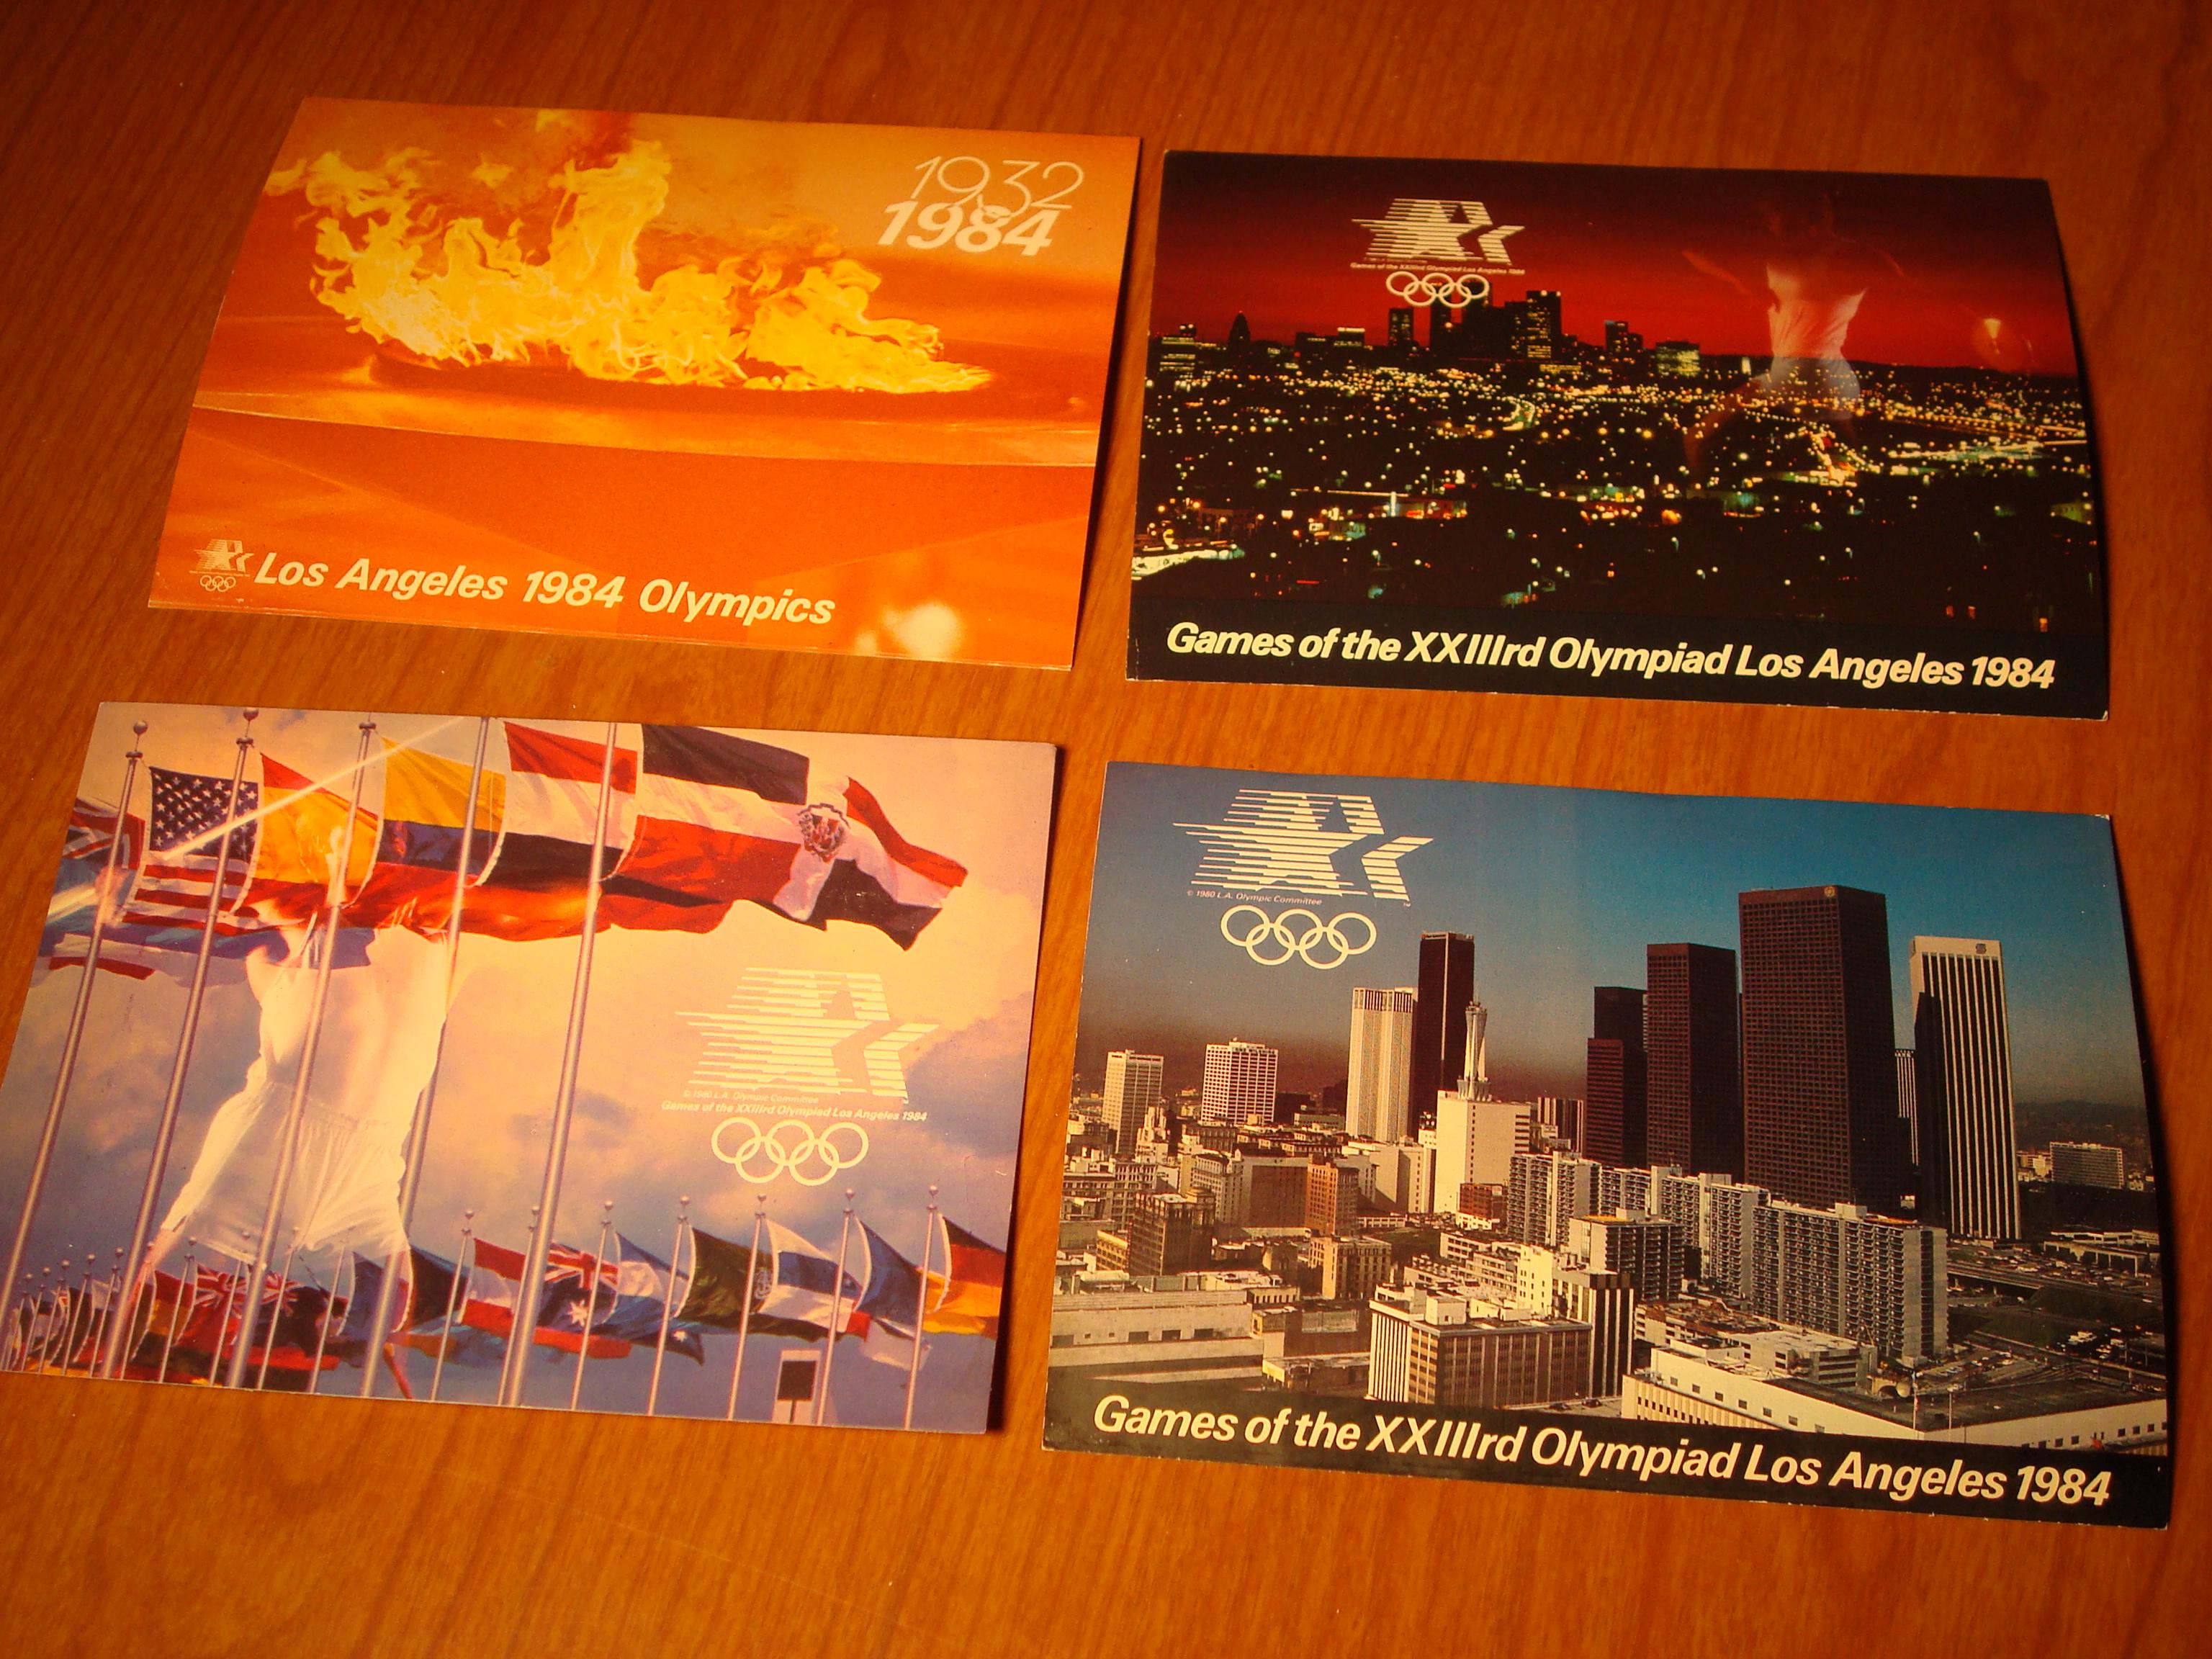 1984 PROMOTIONAL Post Card OPENING CEREMONIES XXIII OLYMPIAD by LeROY NEIMAN